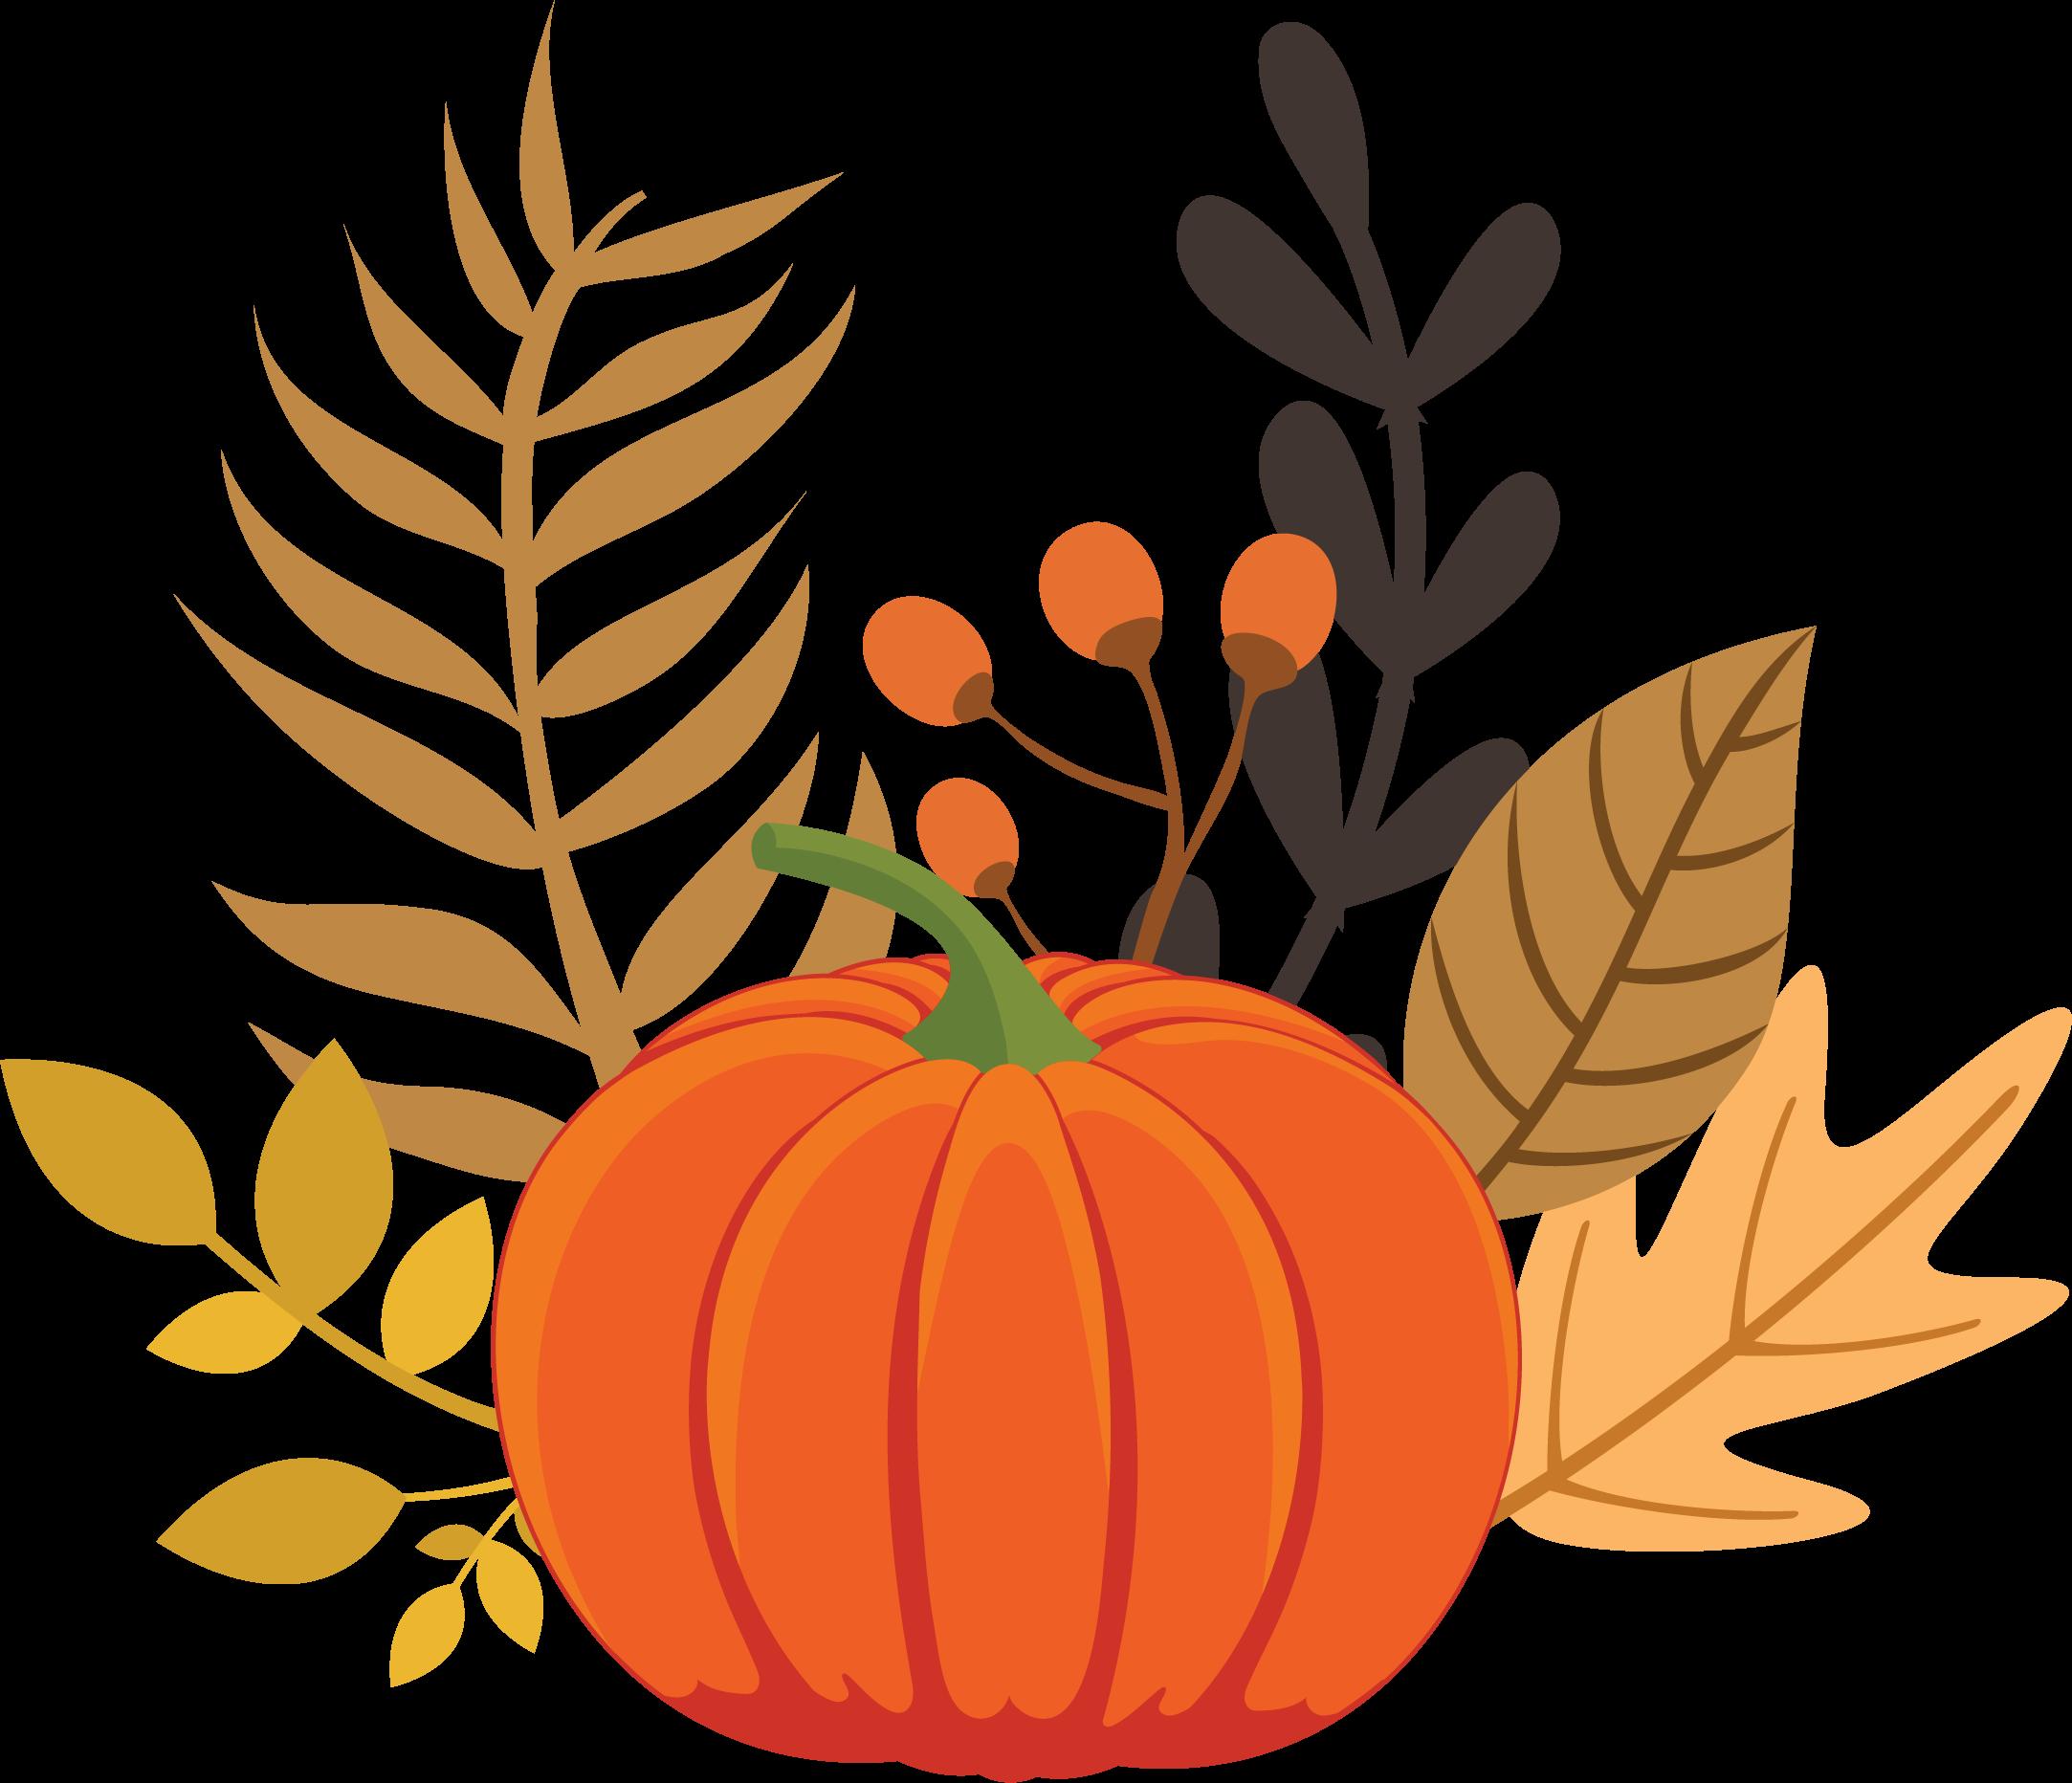 Pumpkin and Leaves Print & Cut File